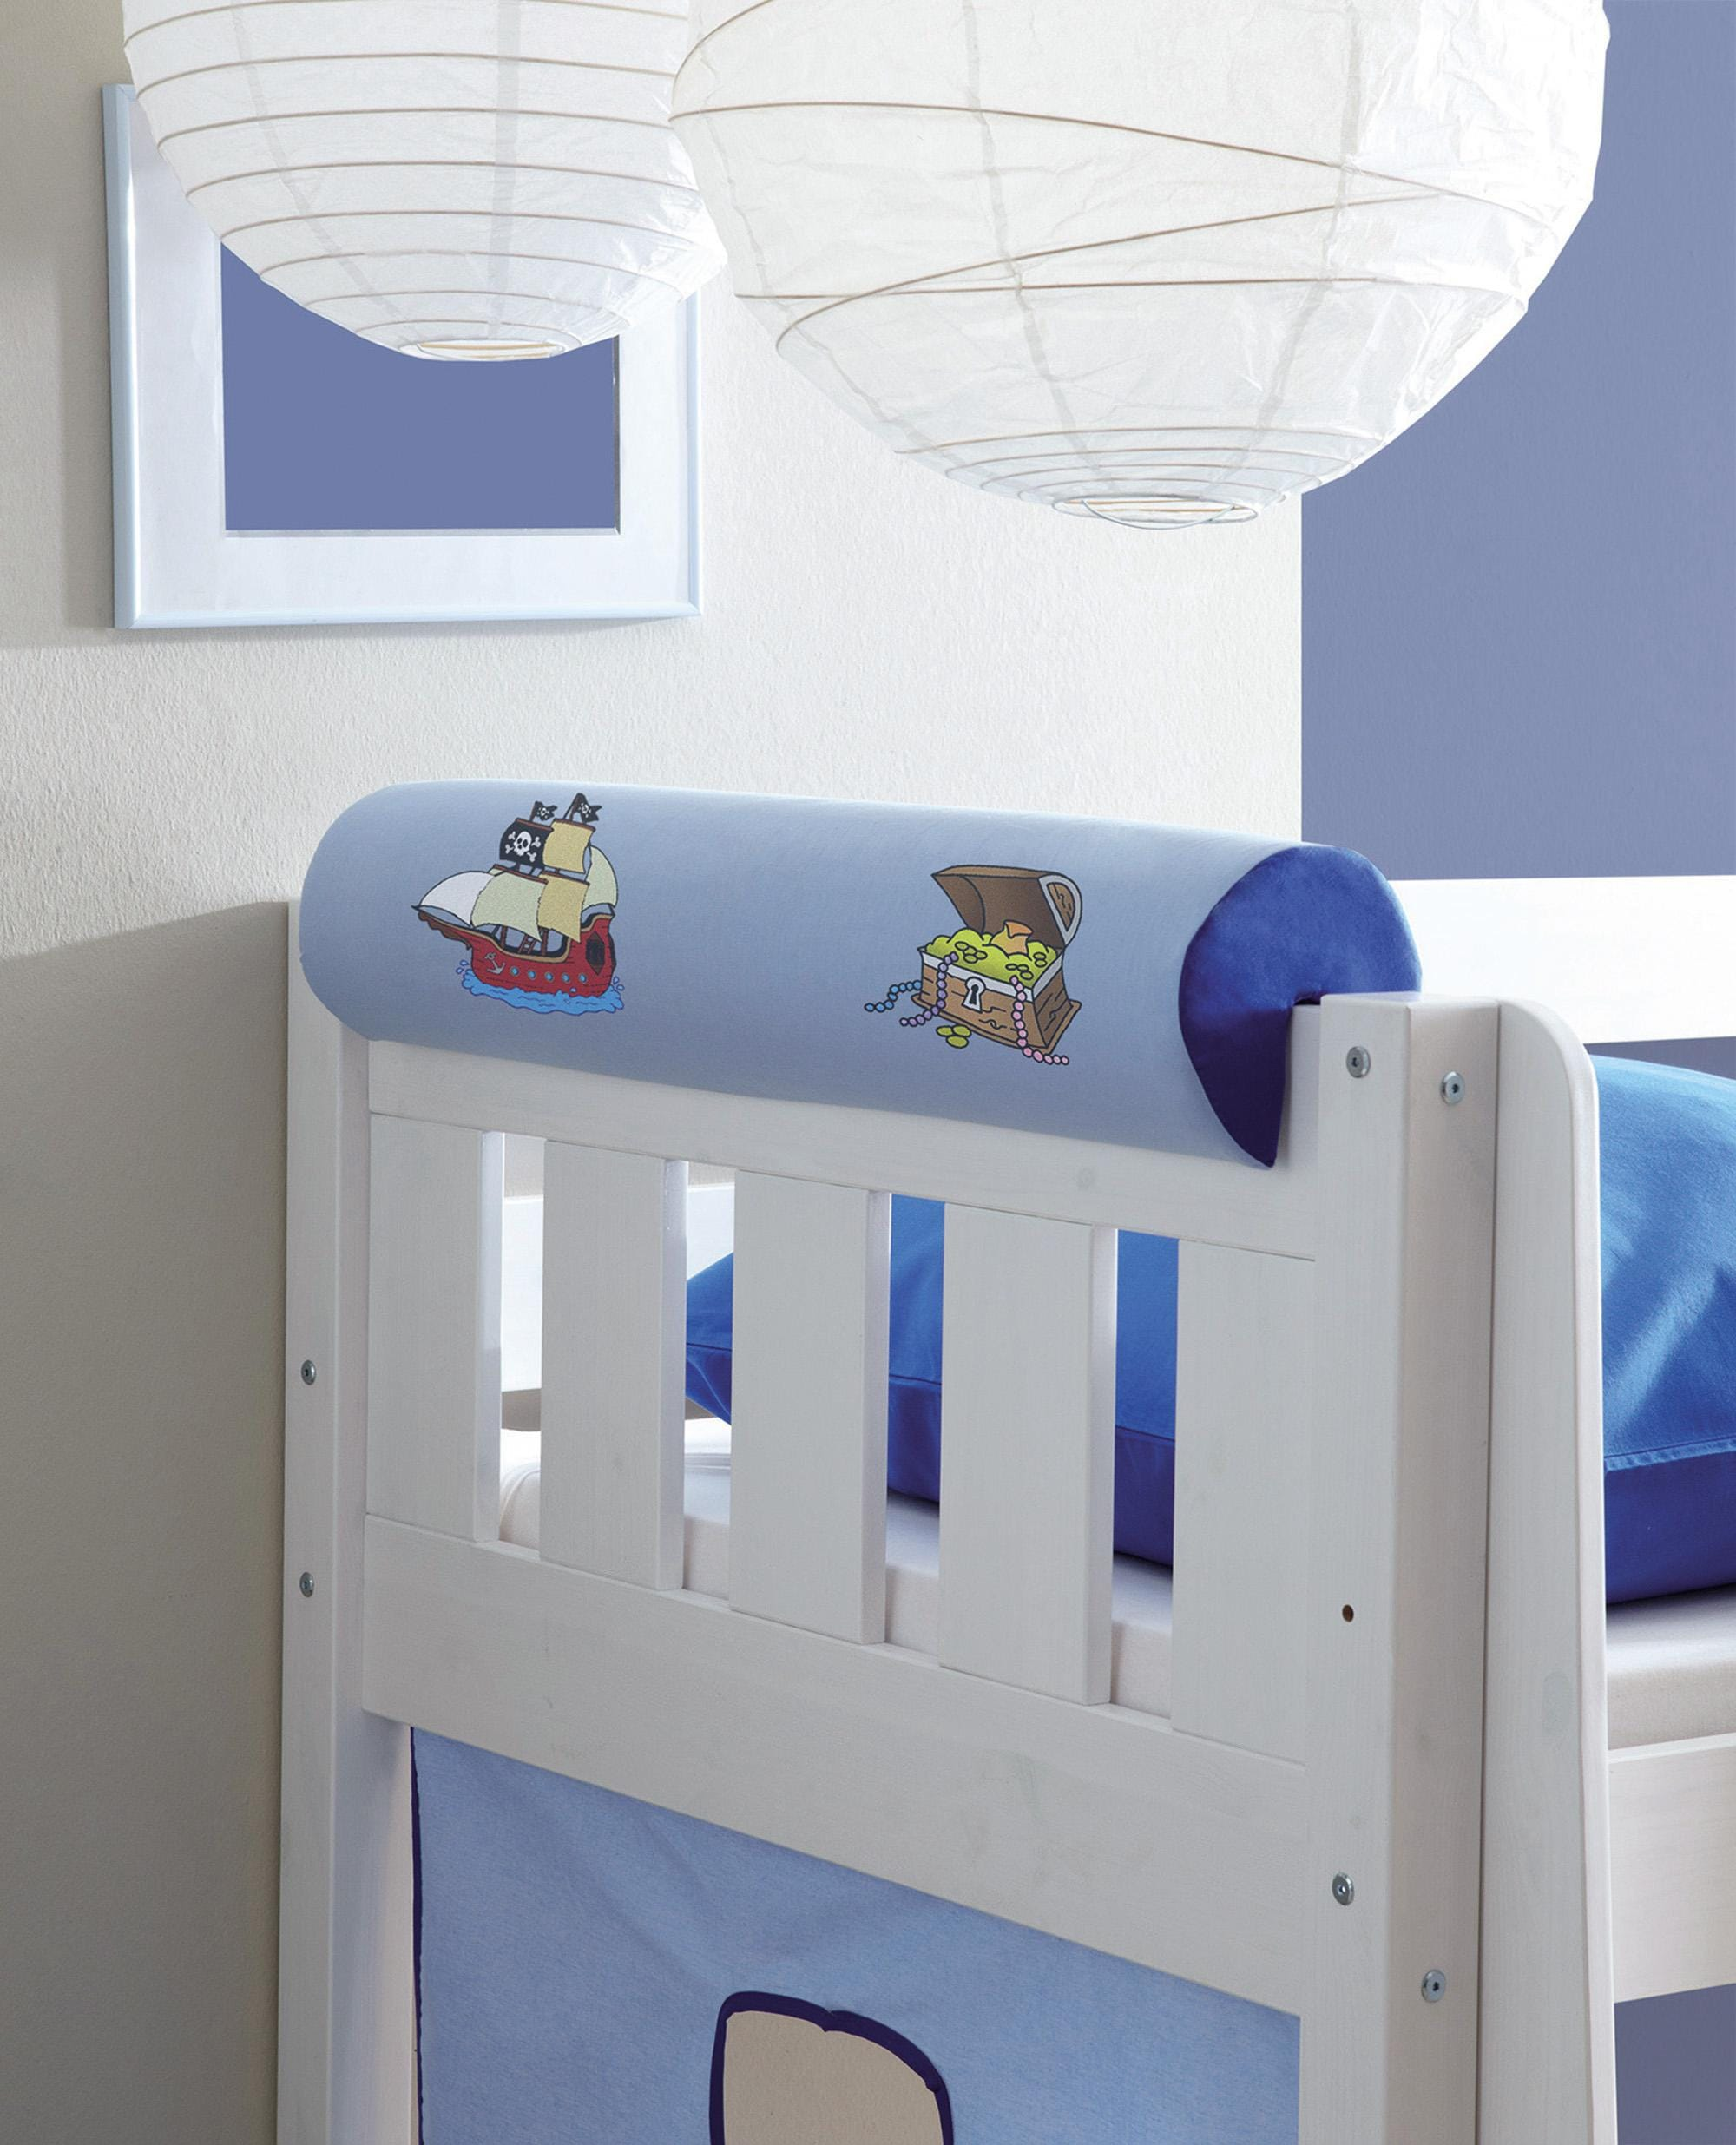 Ticaa Nackenrolle, 1-tlg.   Schlafzimmer > Kopfkissen > Nackenstützkissen & Nackenrollen   Ticaa